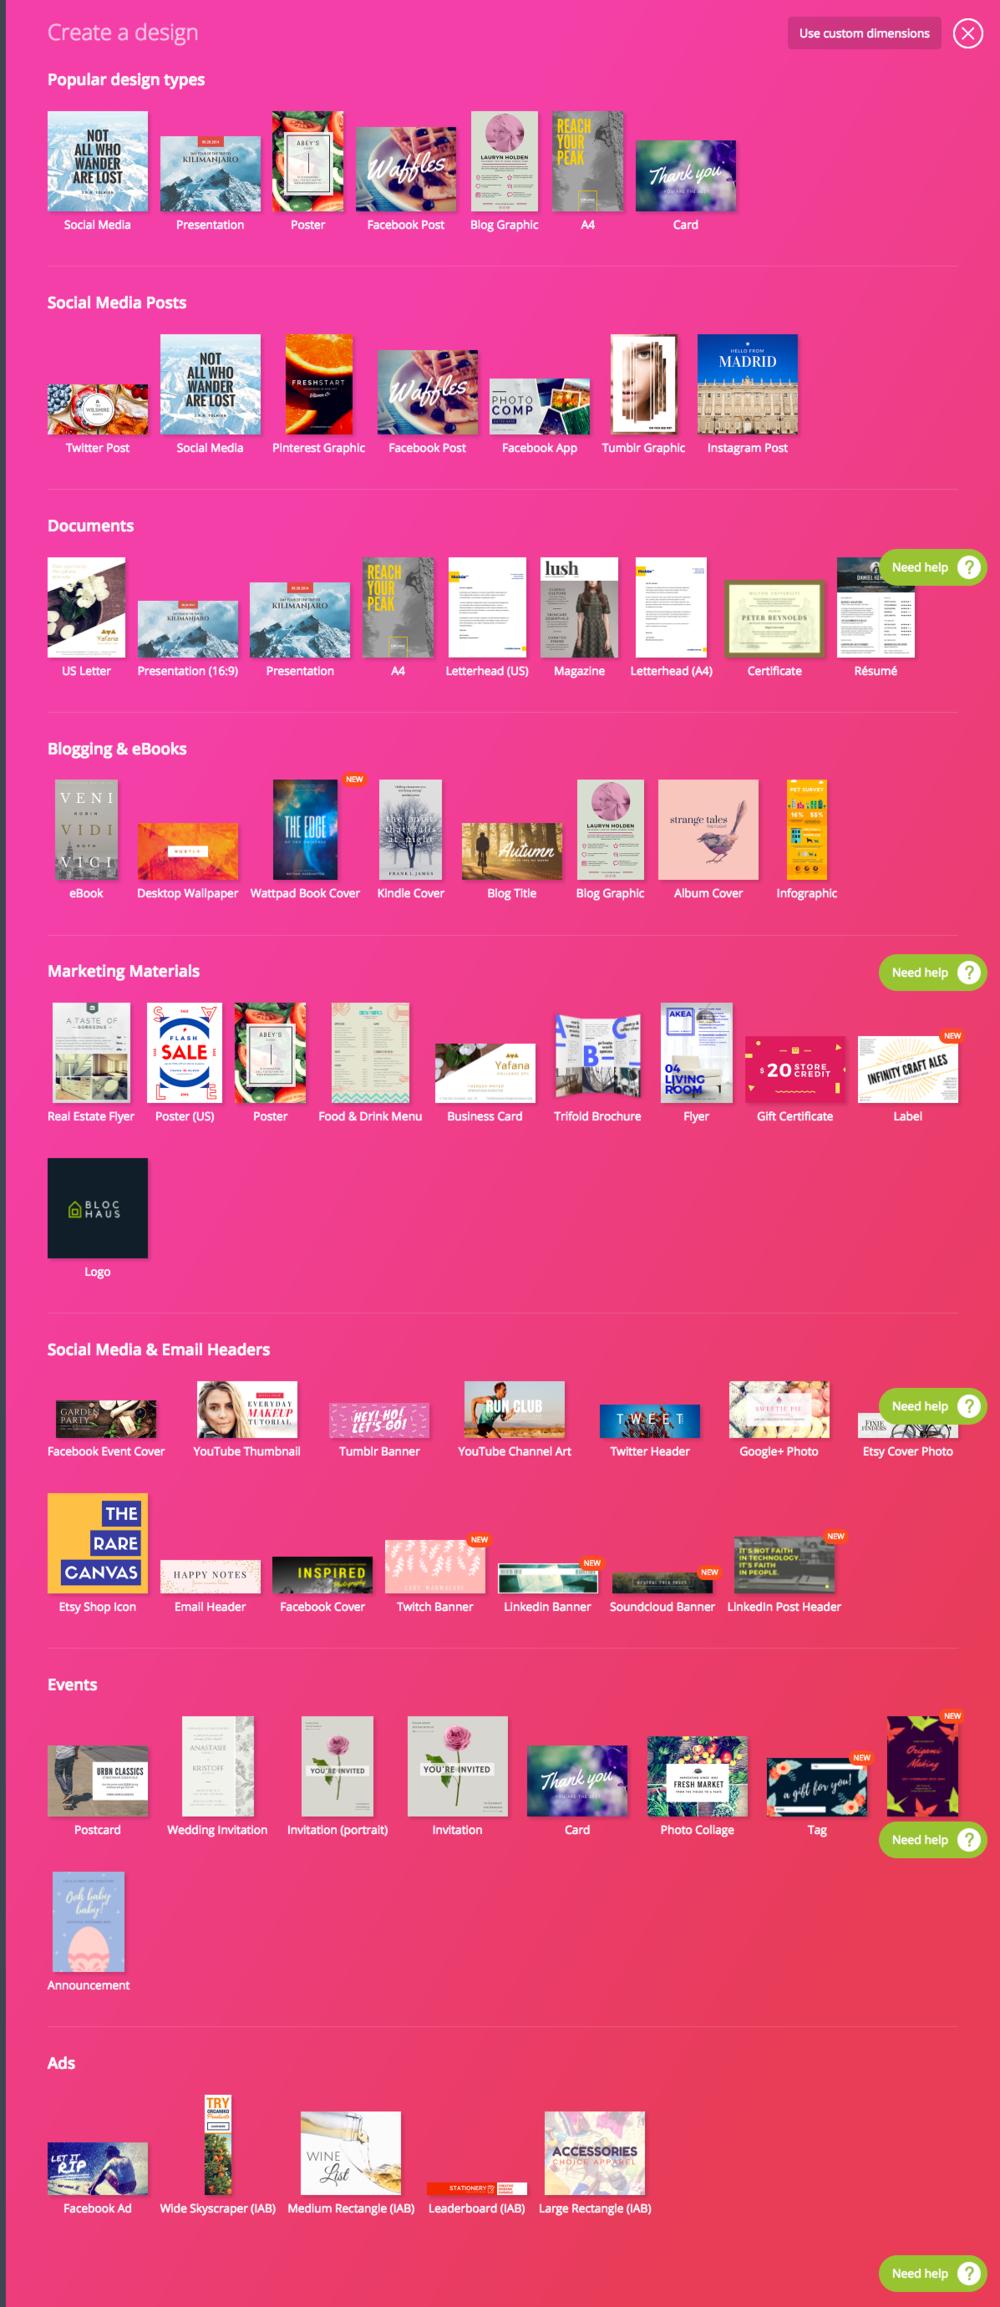 screencapture-canva-create-a-design-1494506150582 copy.png